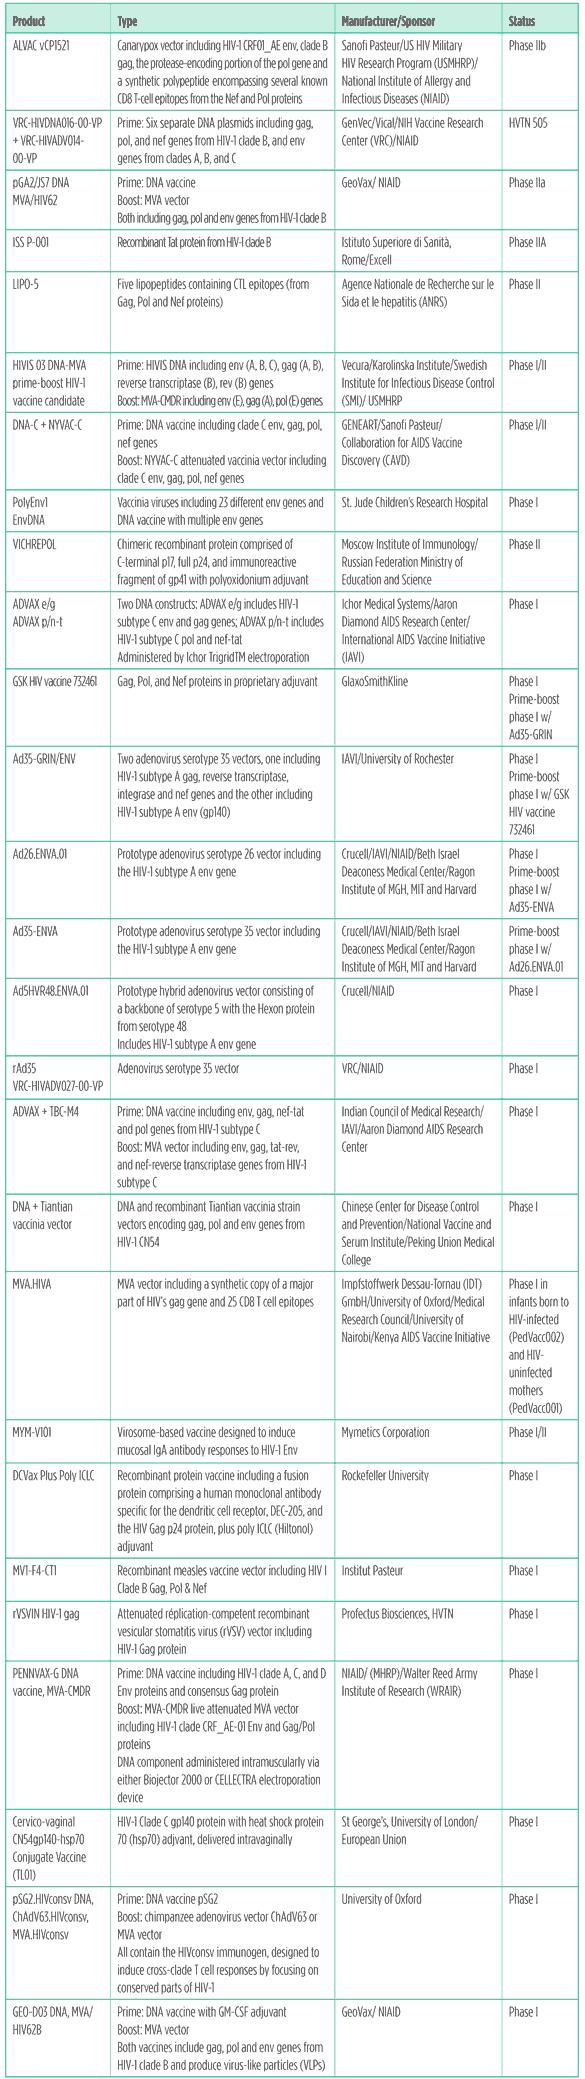 Table 1. HIV vaccines pipeline 2011